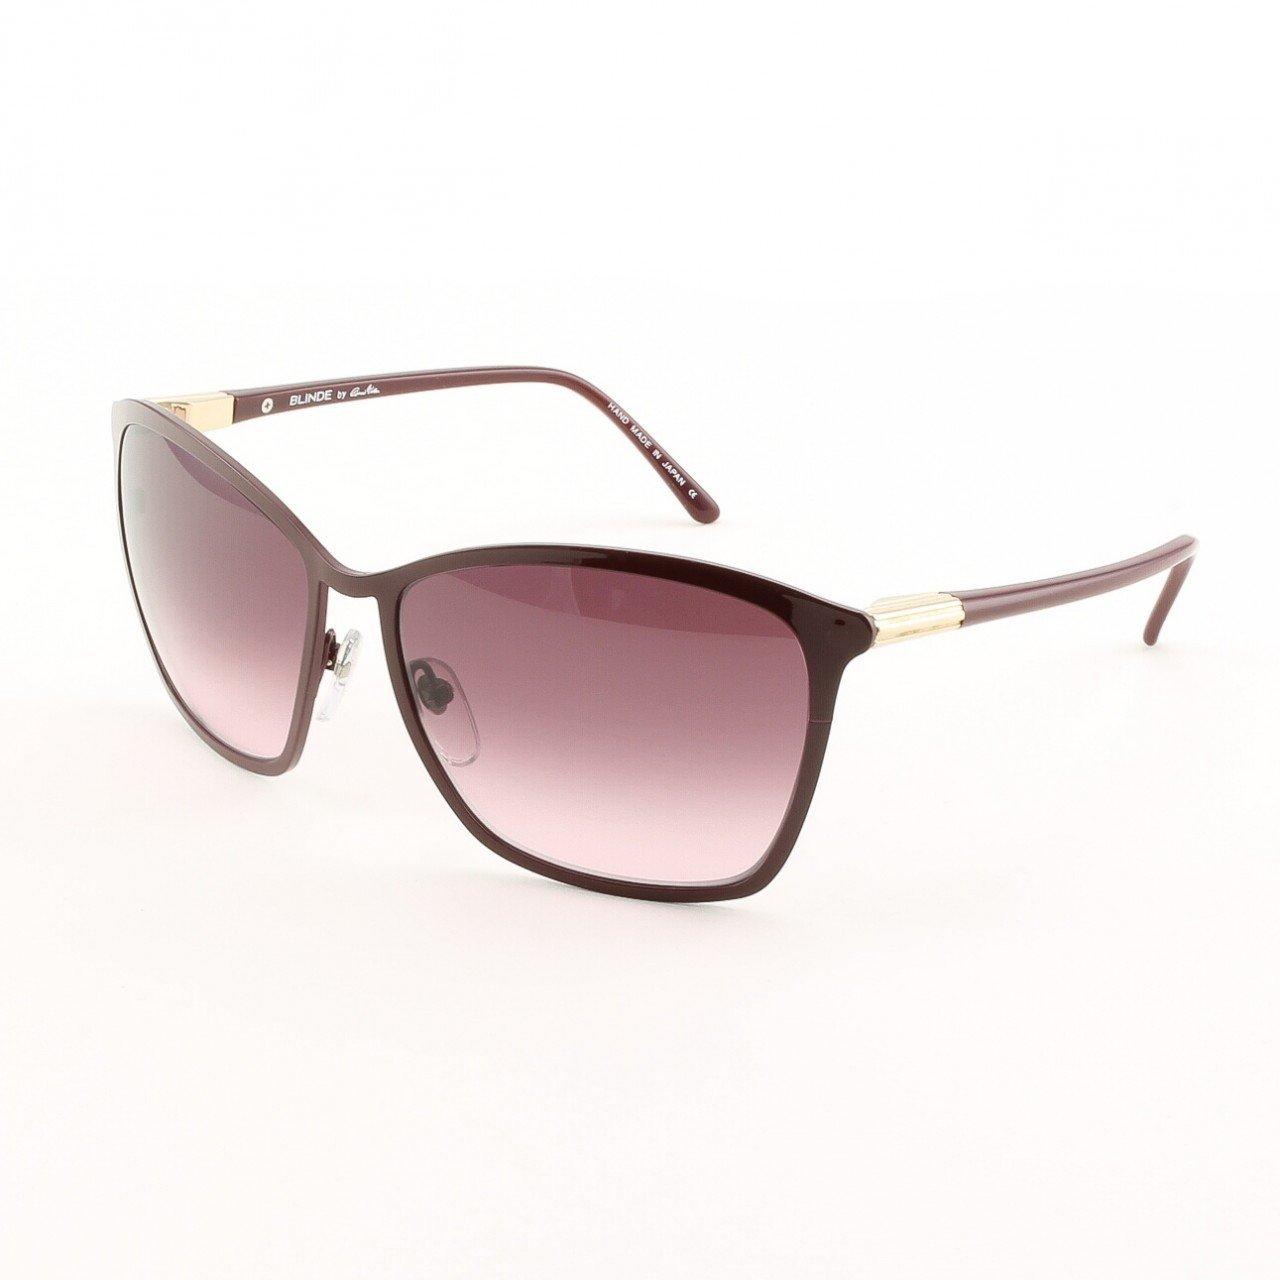 Blinde Ta Da Women's Cat Eye Sunglasses Col. Burgundy with Pink Gradient Lenses